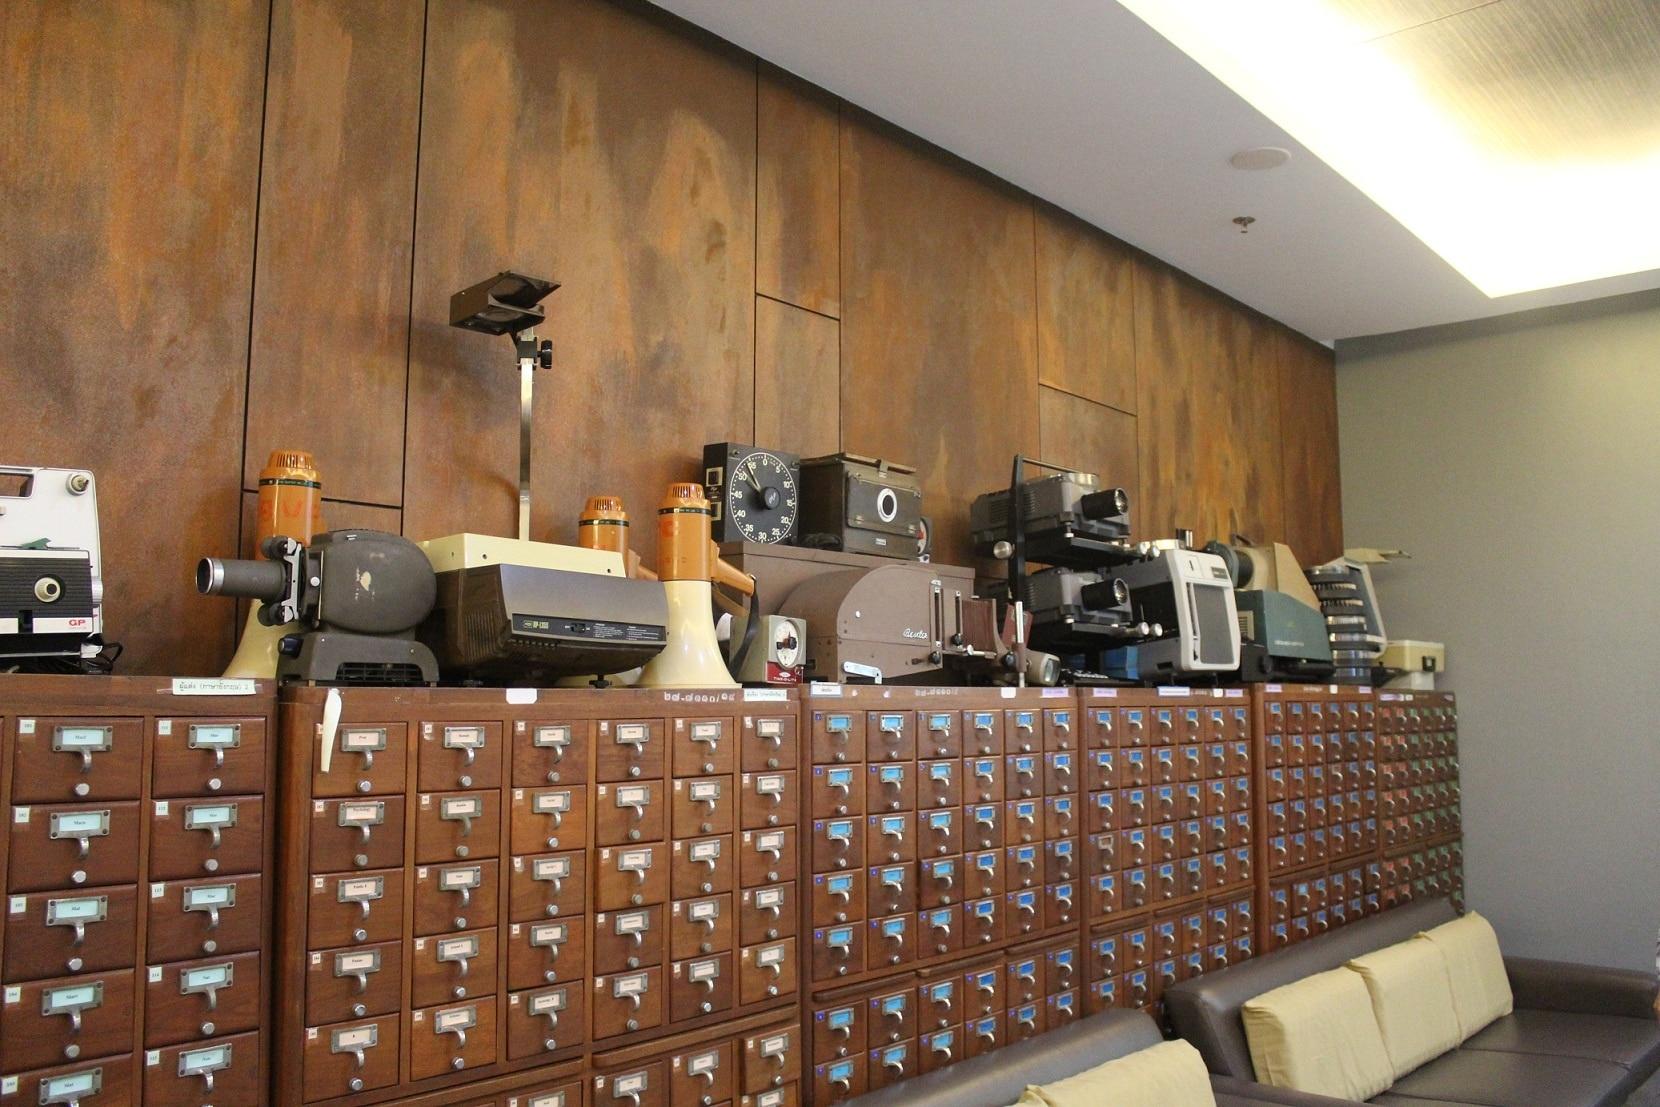 Koleksi Konvensional (Laci Katalog, Kamera, Mesin Tik, Radio dll)